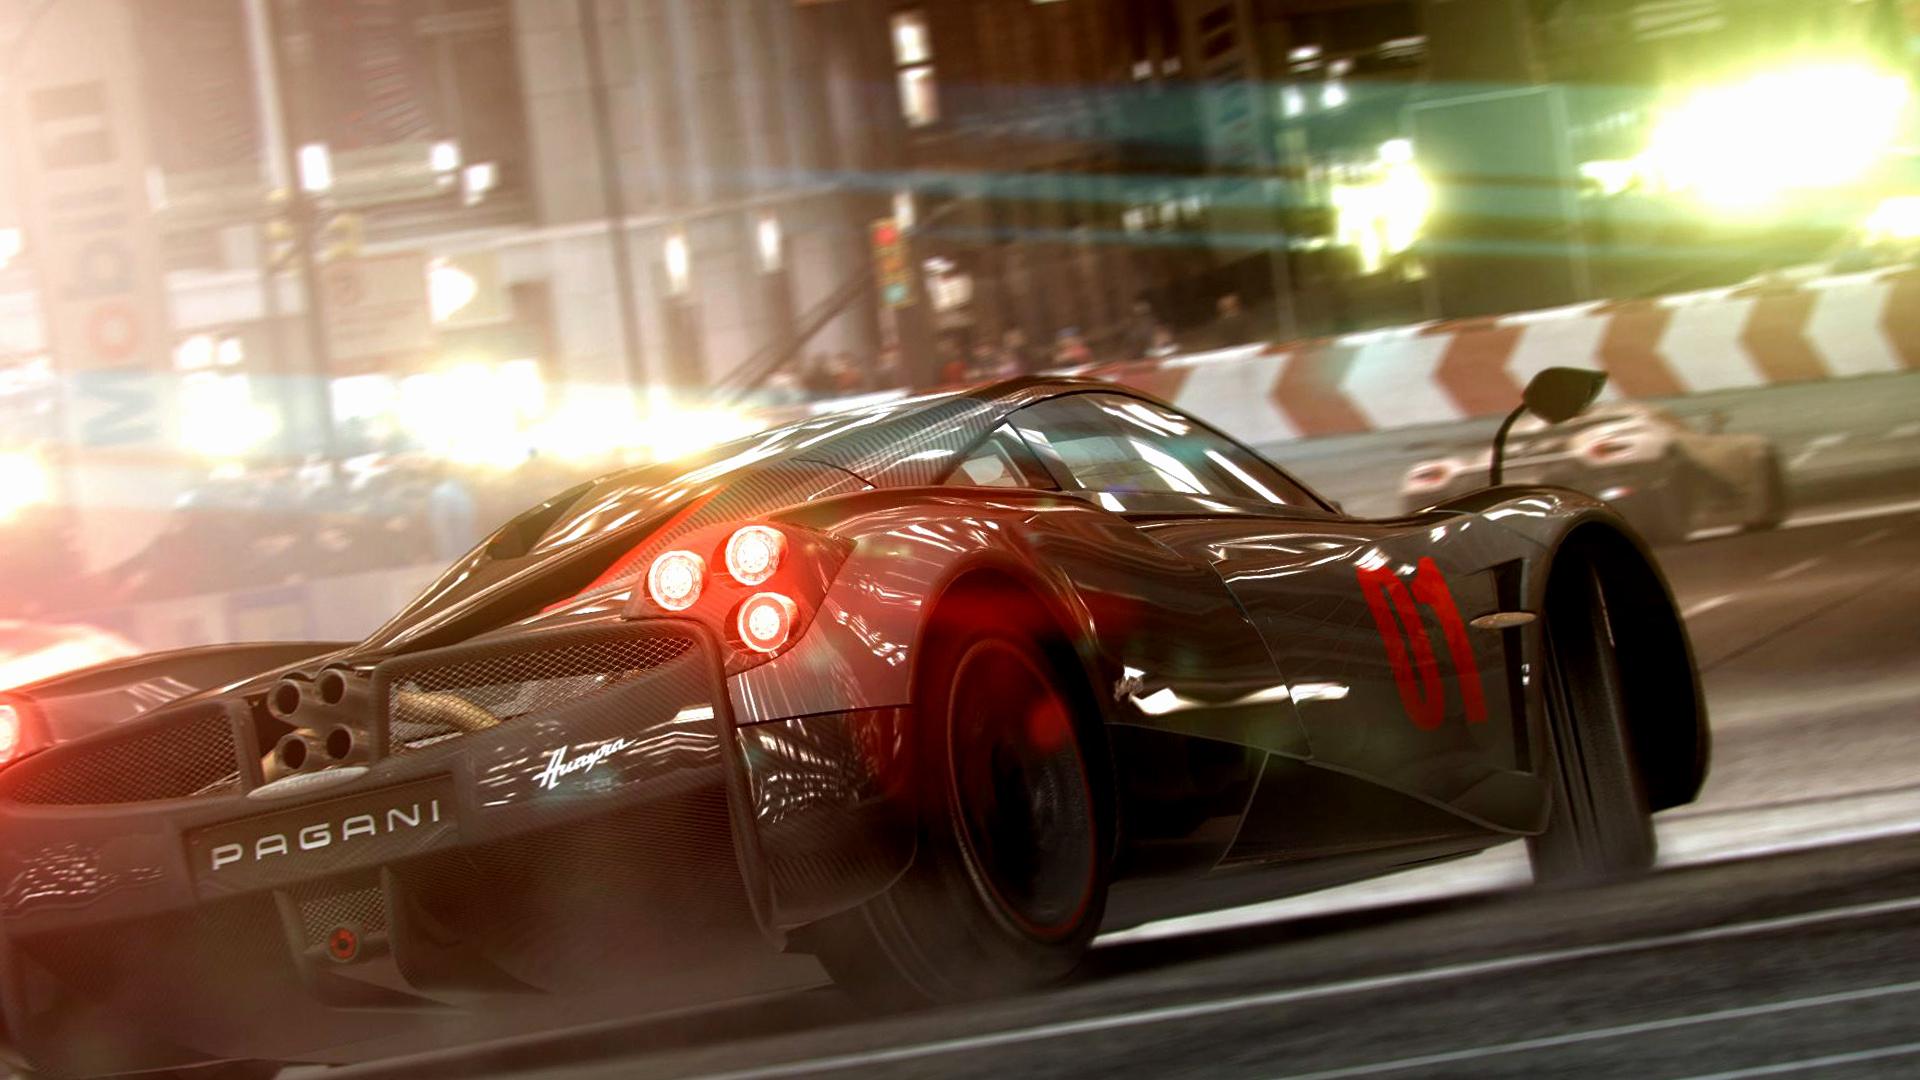 4k gaming wallpaper,vehicle,supercar,car,automotive design,sports car